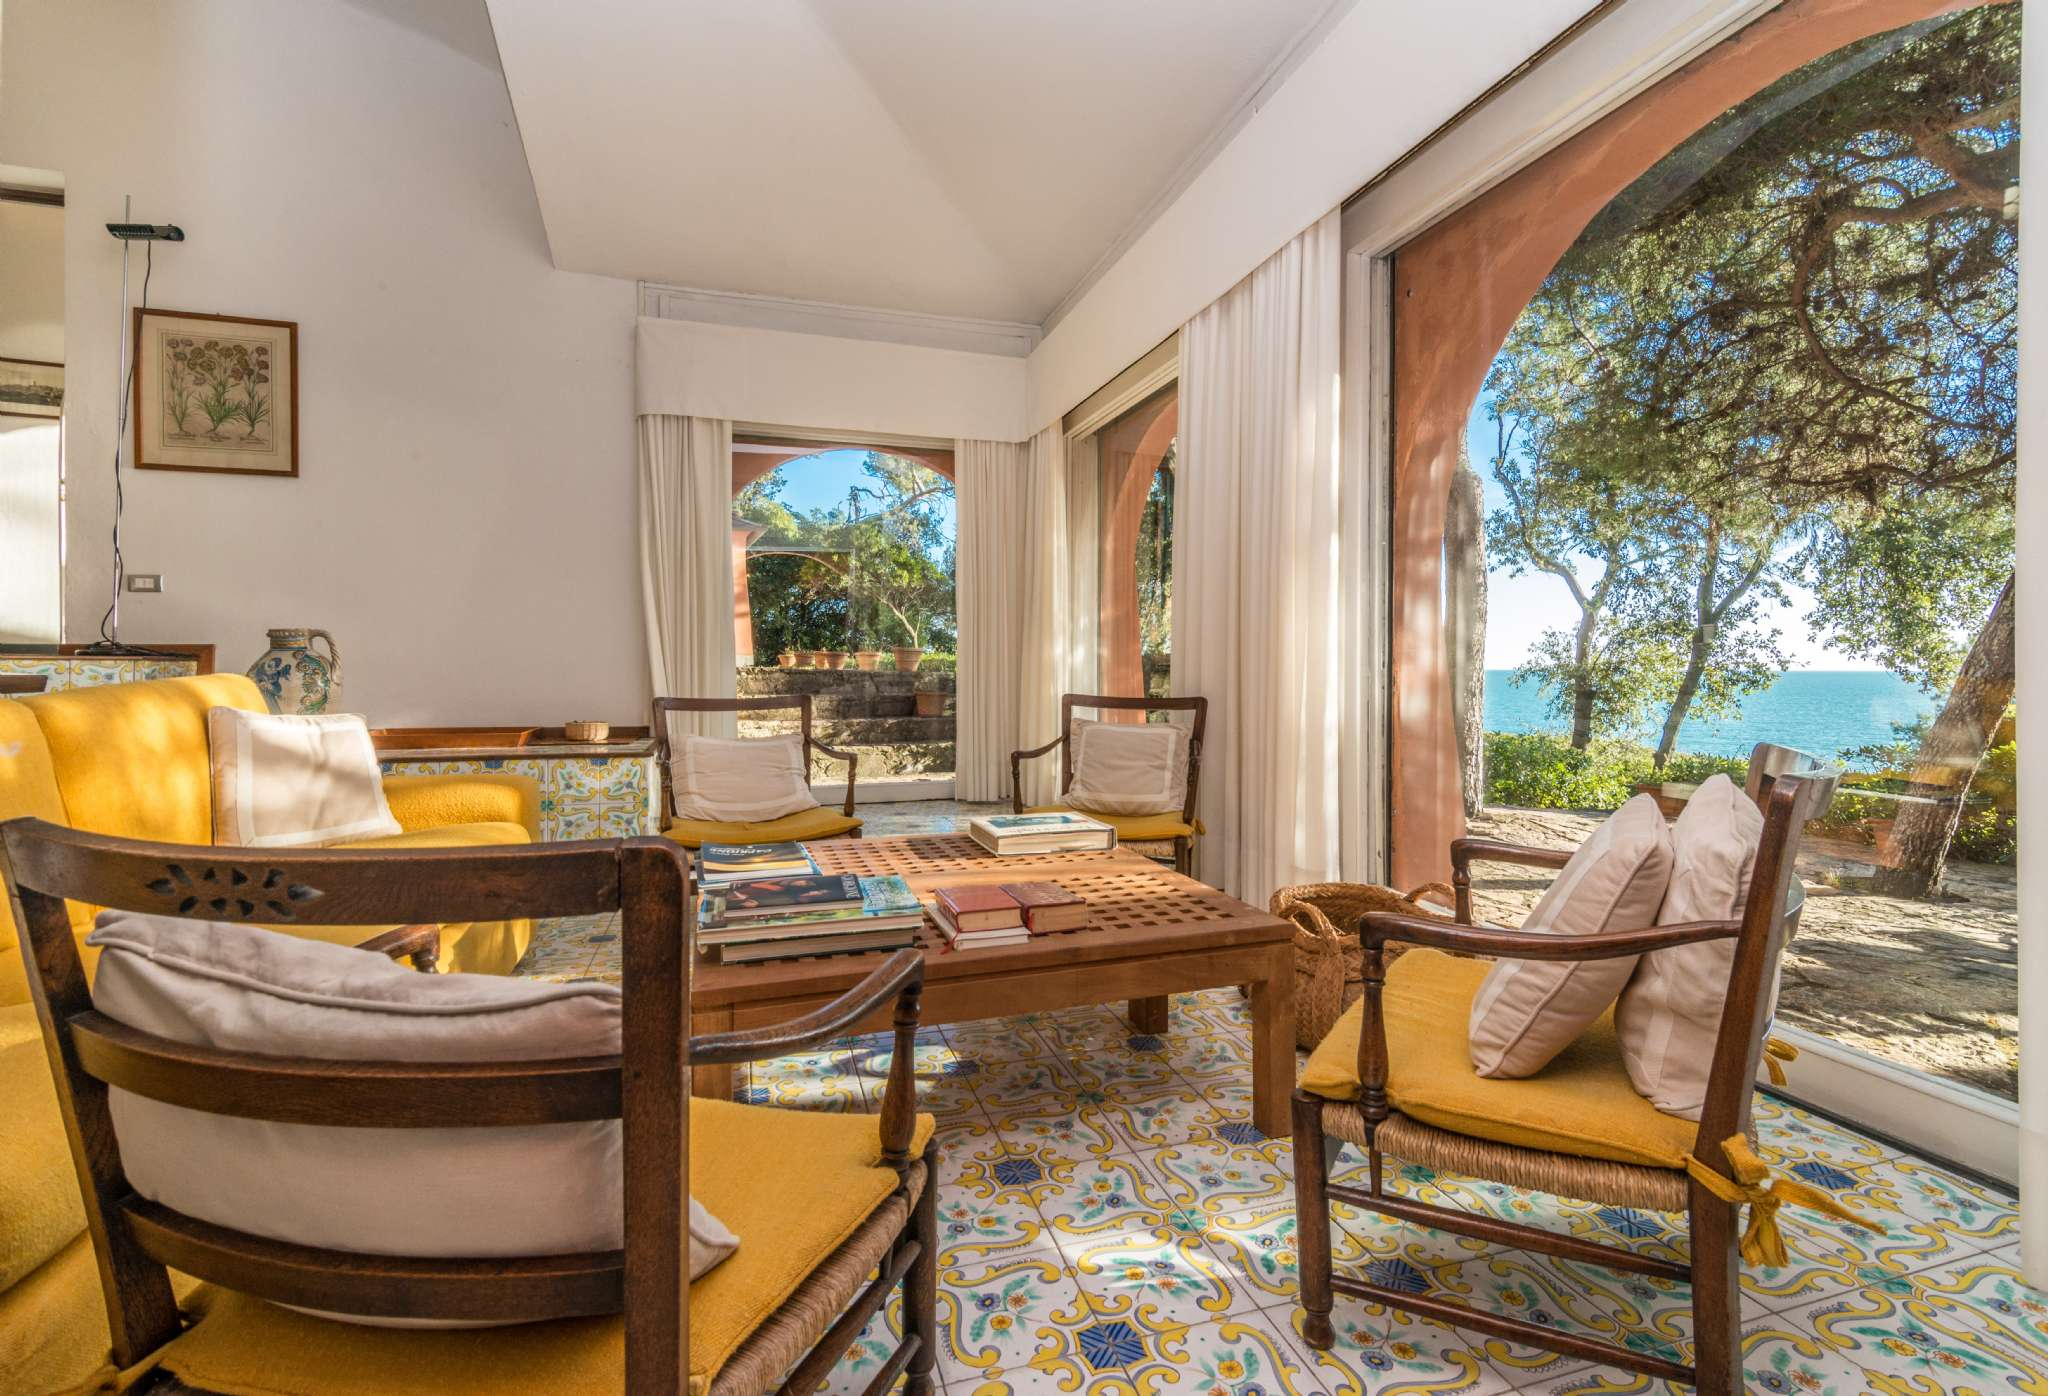 Villa in Vendita a Lerici: 5 locali, 300 mq - Foto 9